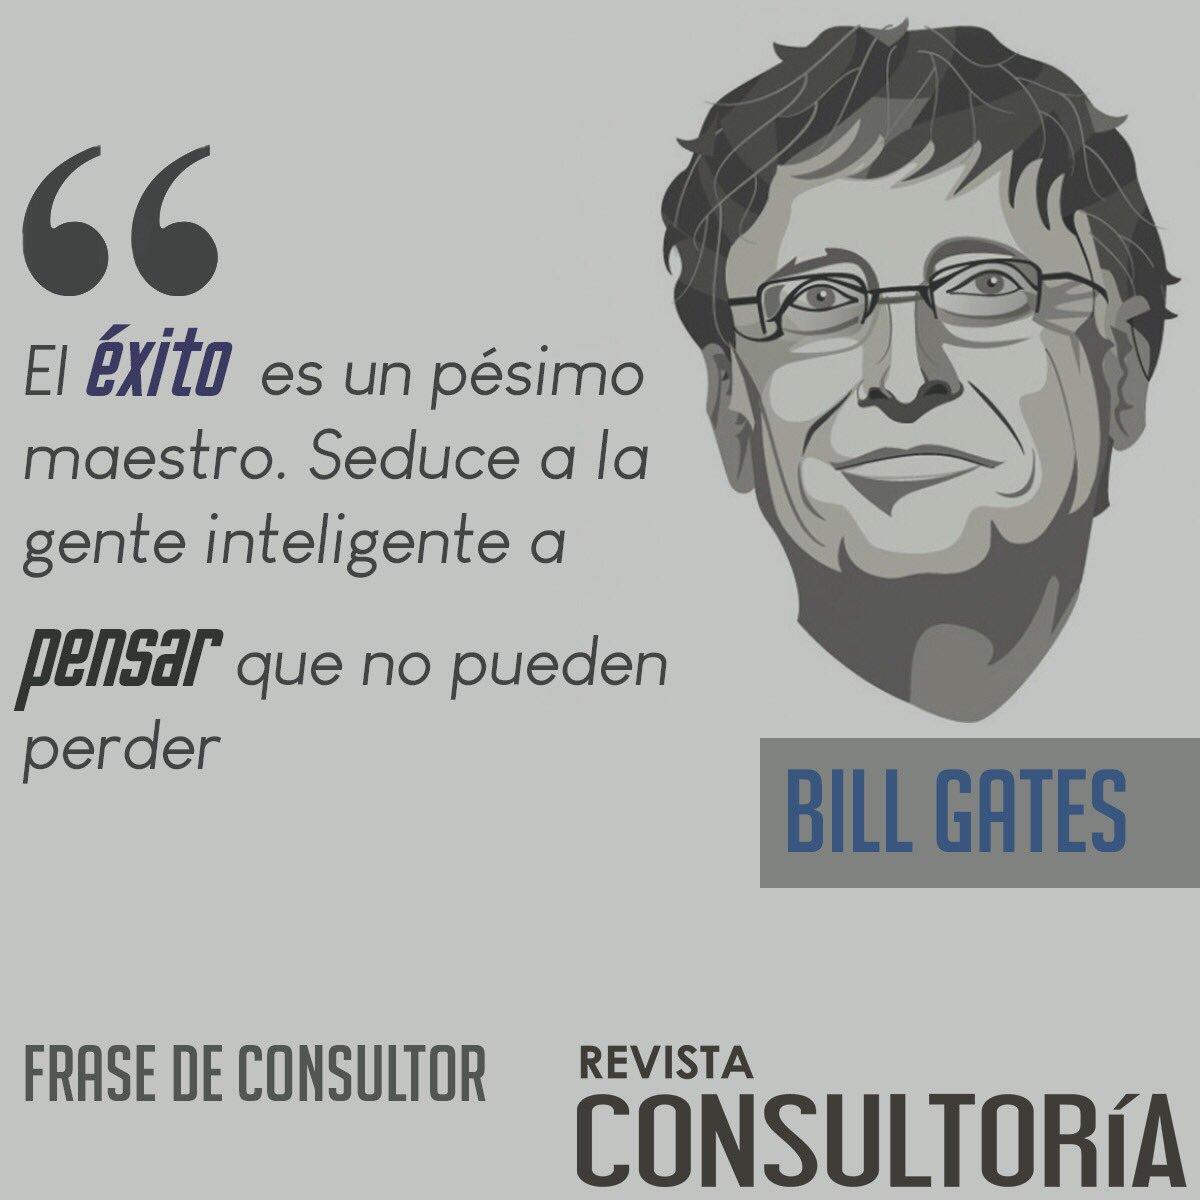 Revista Consultoría's photo on #FinDeSemana